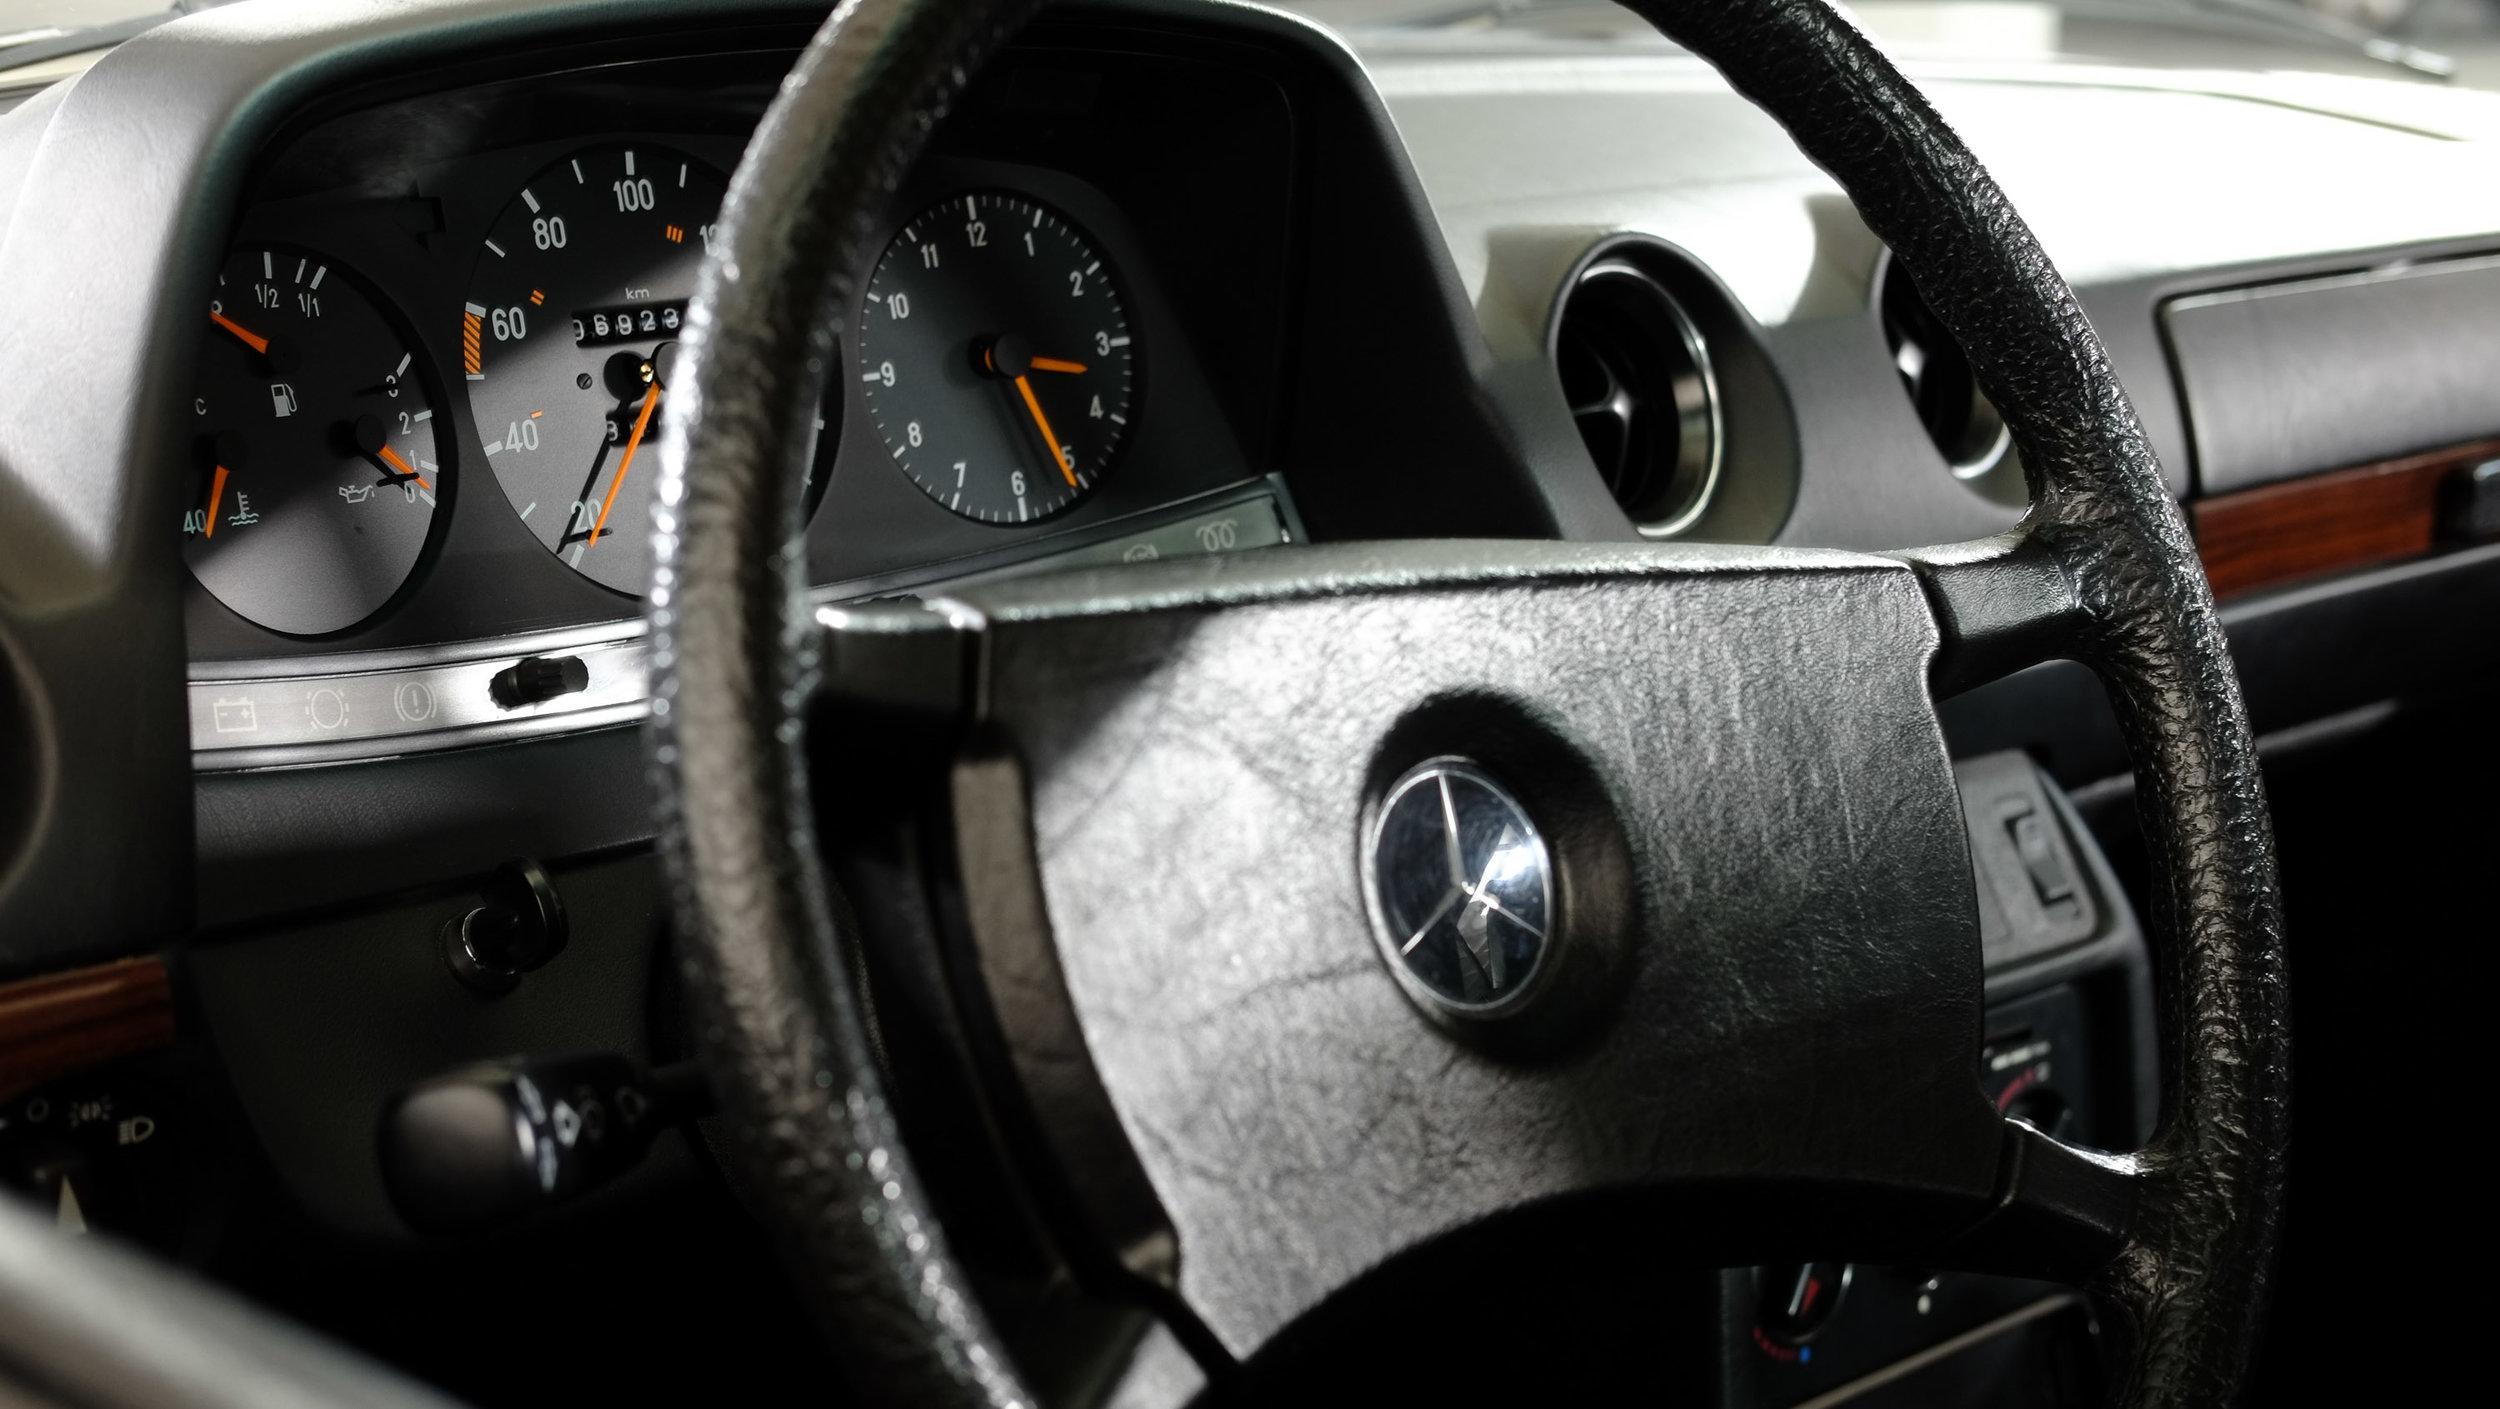 coolnvintage Mercedes-Benz W123 300D (40 of 59).jpg